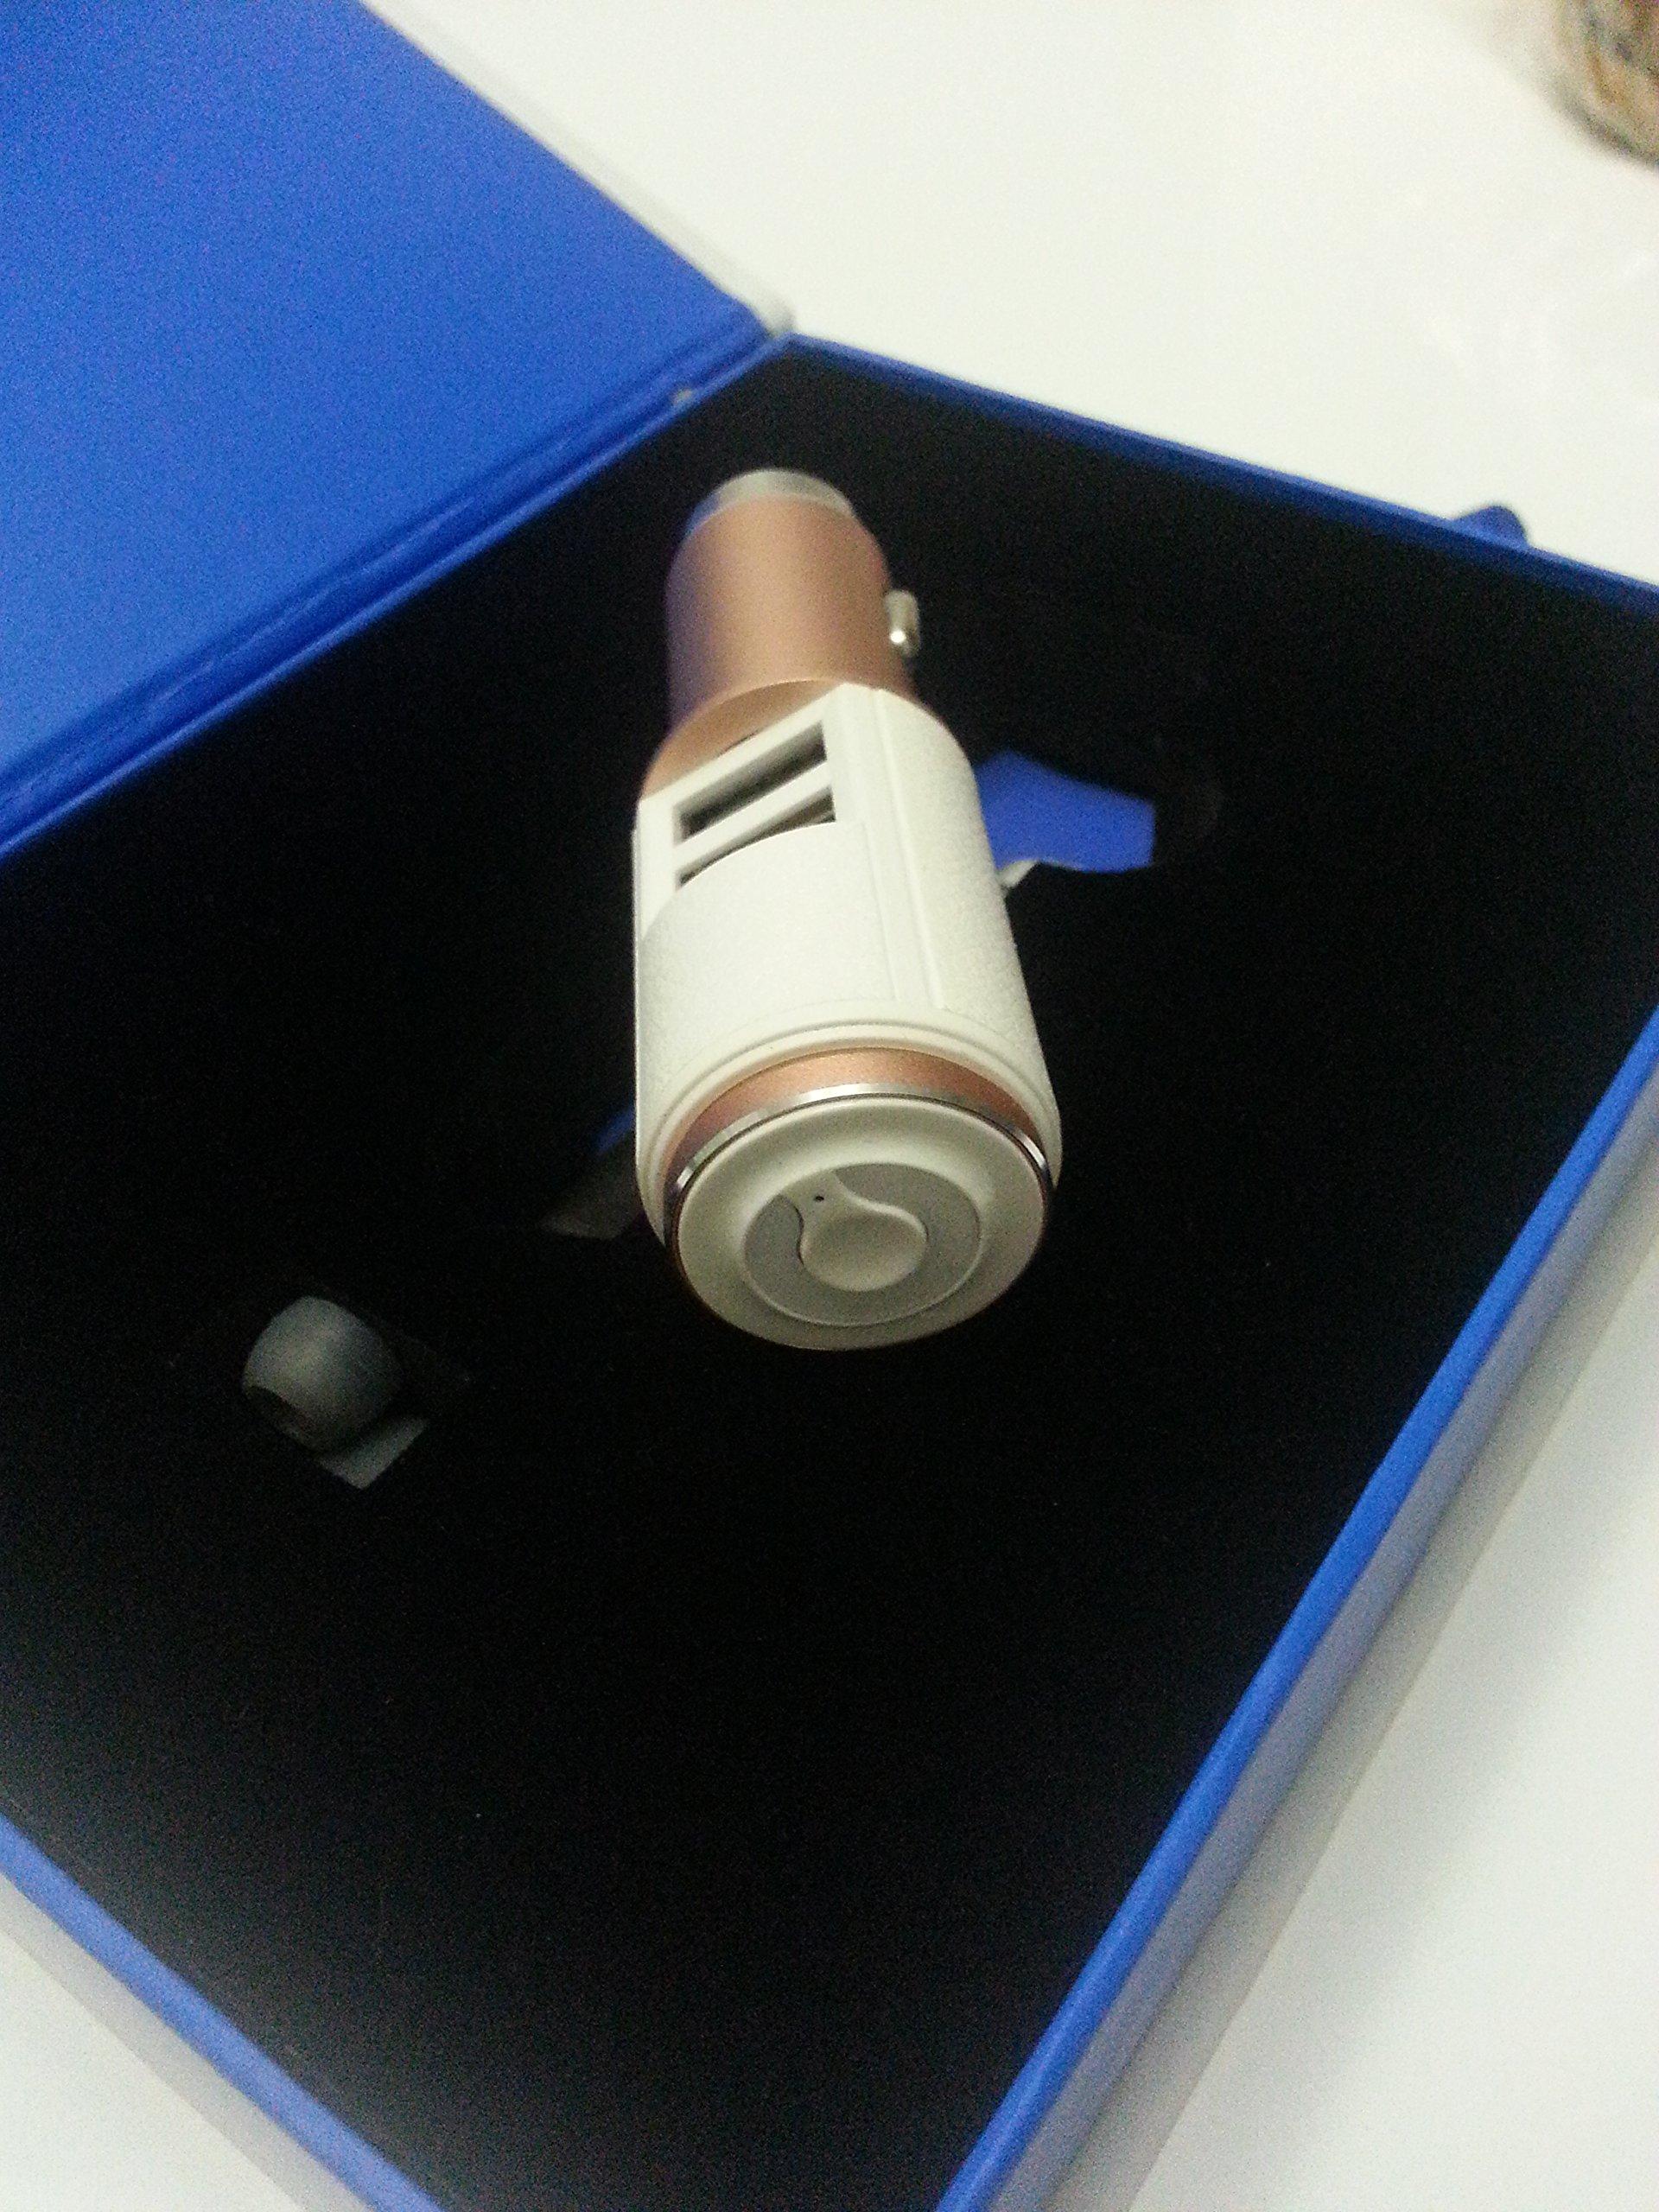 AUKEY-Bluetooth-V40-Empfnger-fr-KFZ-Auto-mit-Stereo-35-mm-Aux-3-Port-USB-Autoladegert